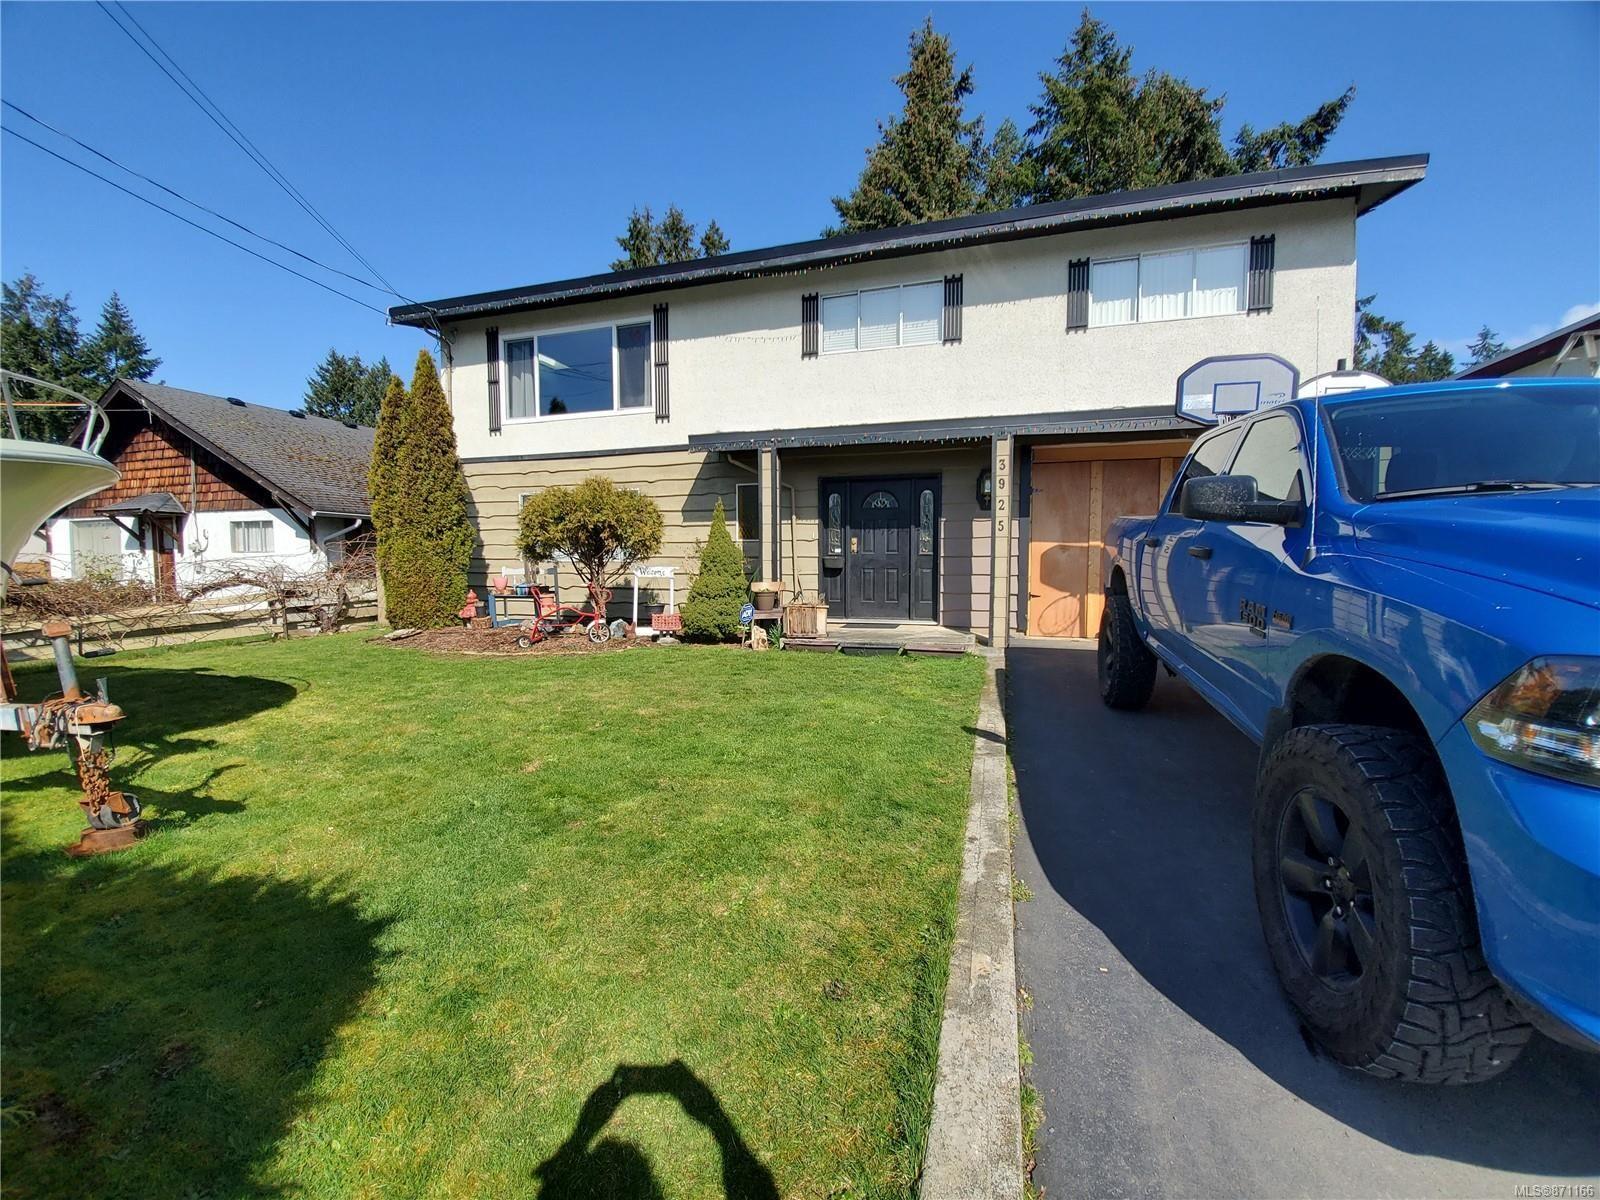 Main Photo: 3925 Shaughnessy St in : PA Port Alberni House for sale (Port Alberni)  : MLS®# 871166